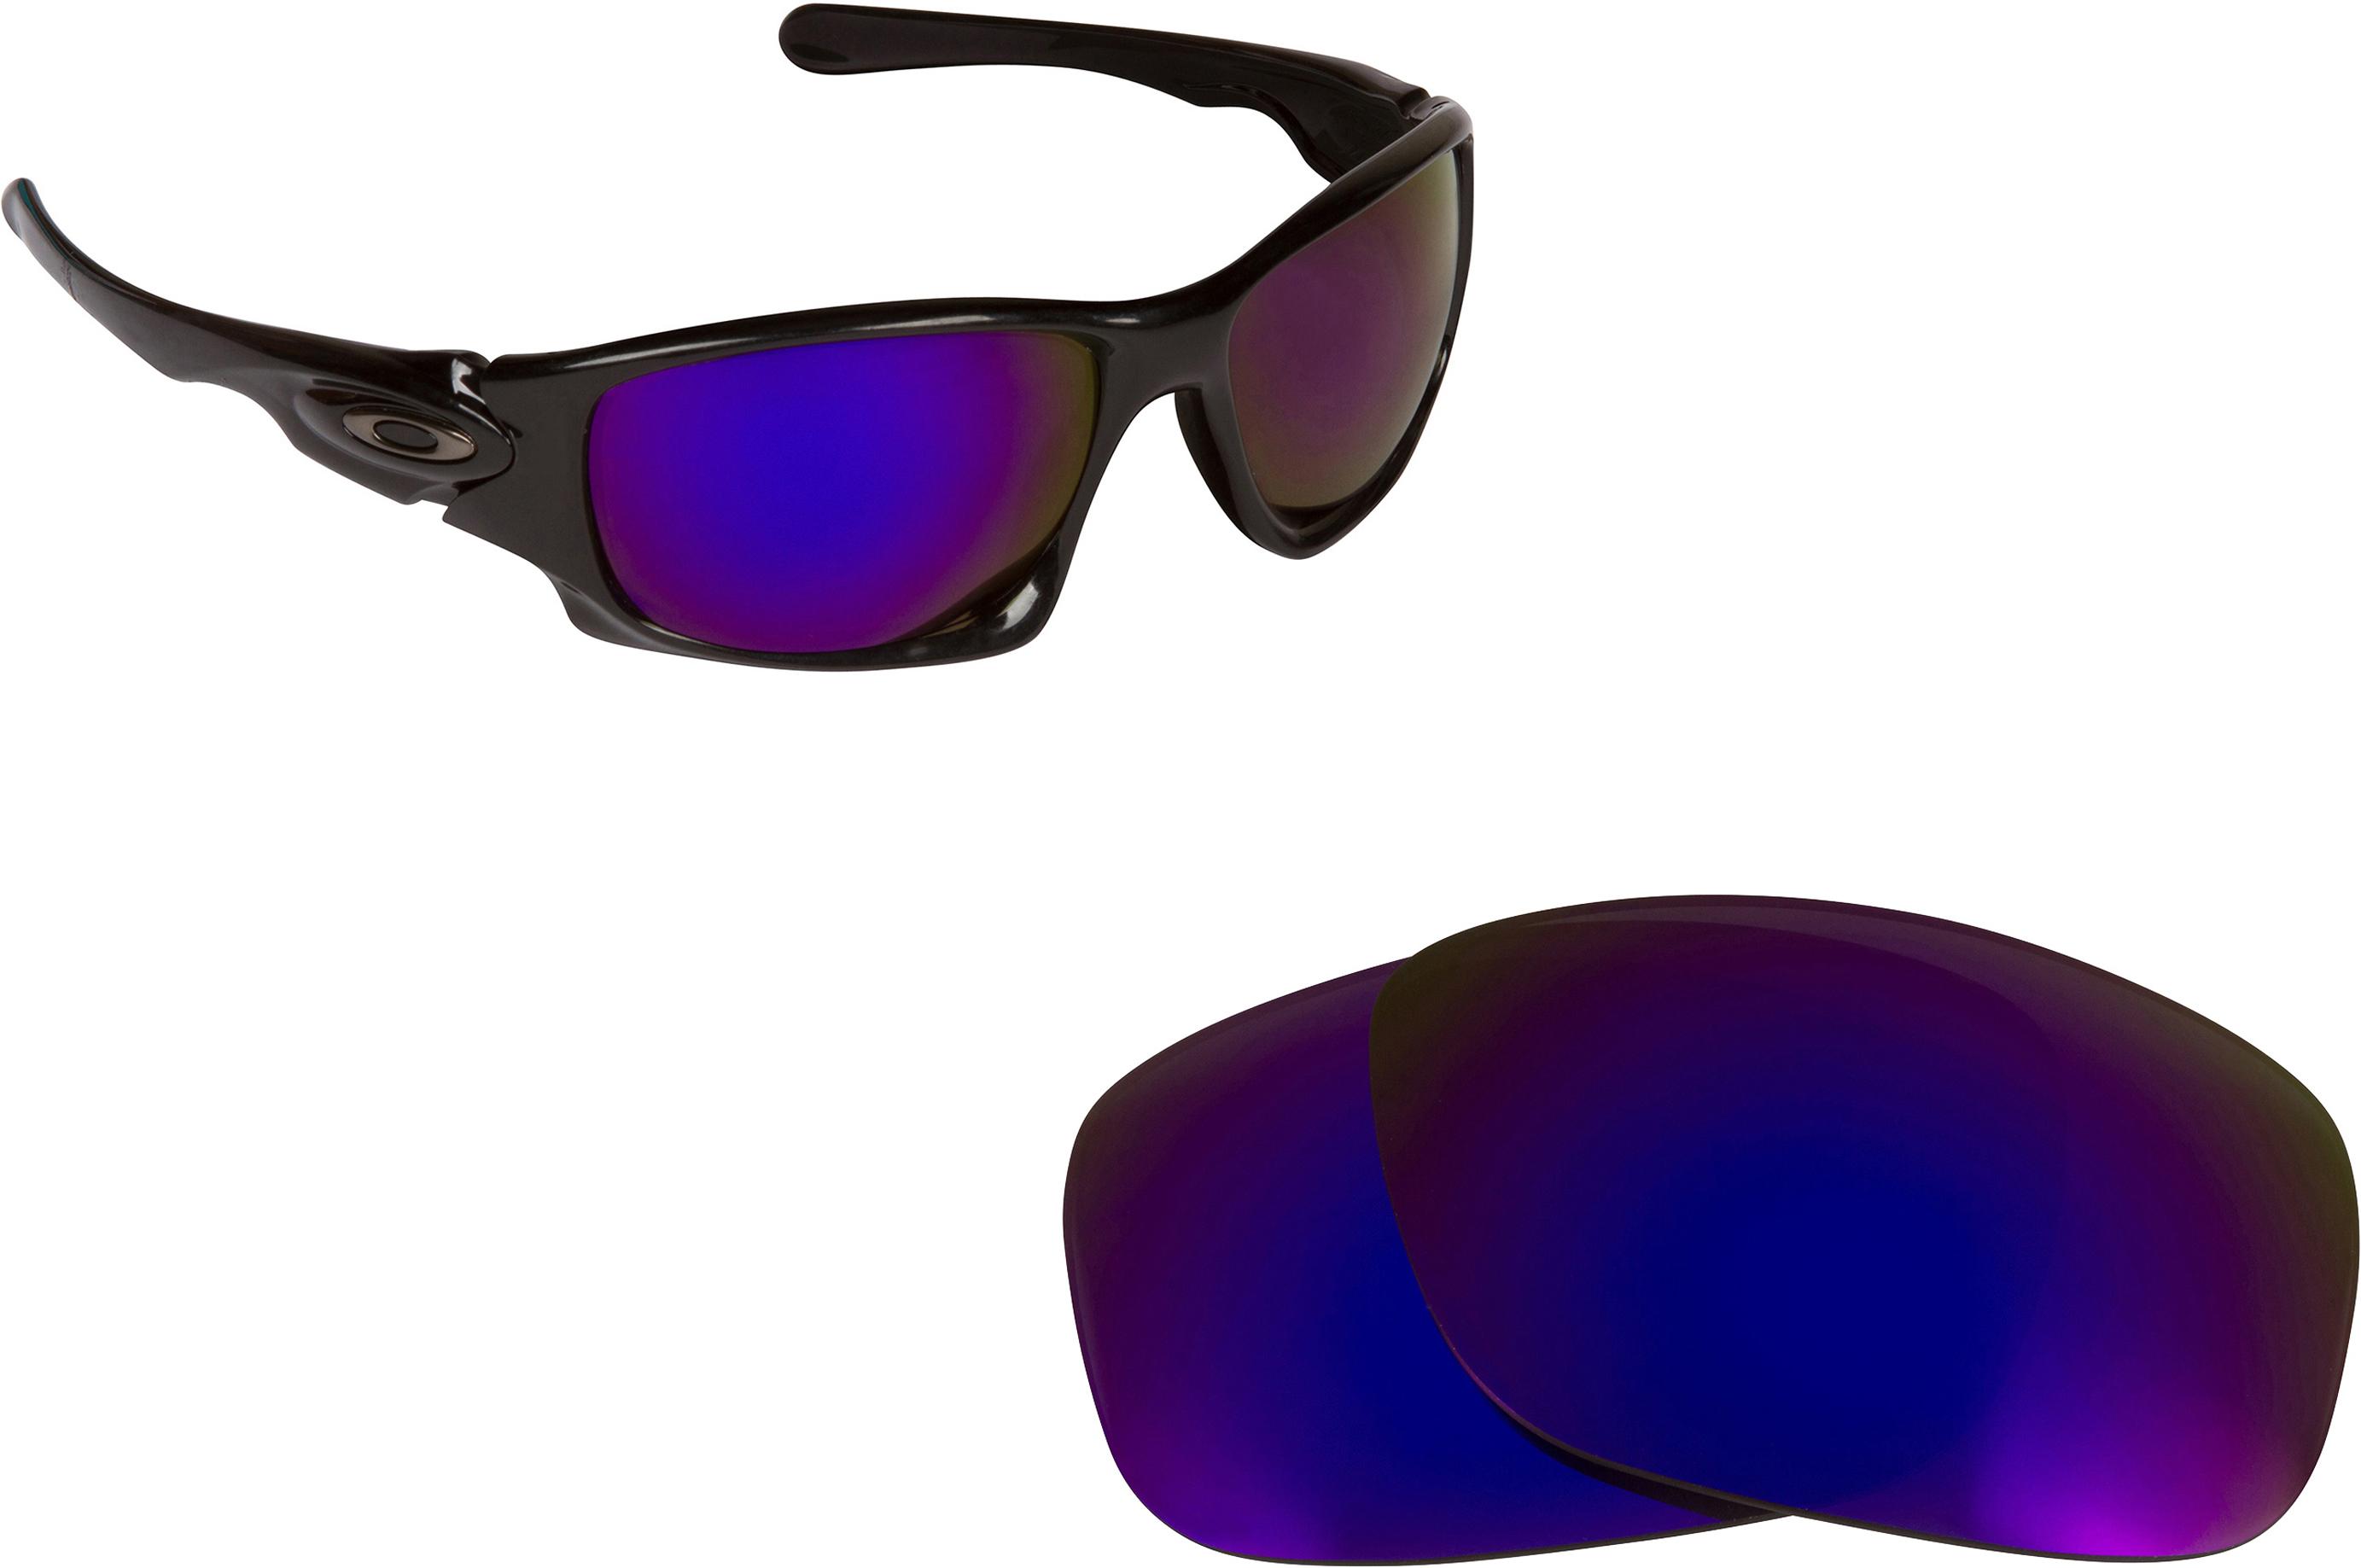 814d6d425b Ten X Replacement Lenses by SEEK OPTICS to fit OAKLEY Sunglasses